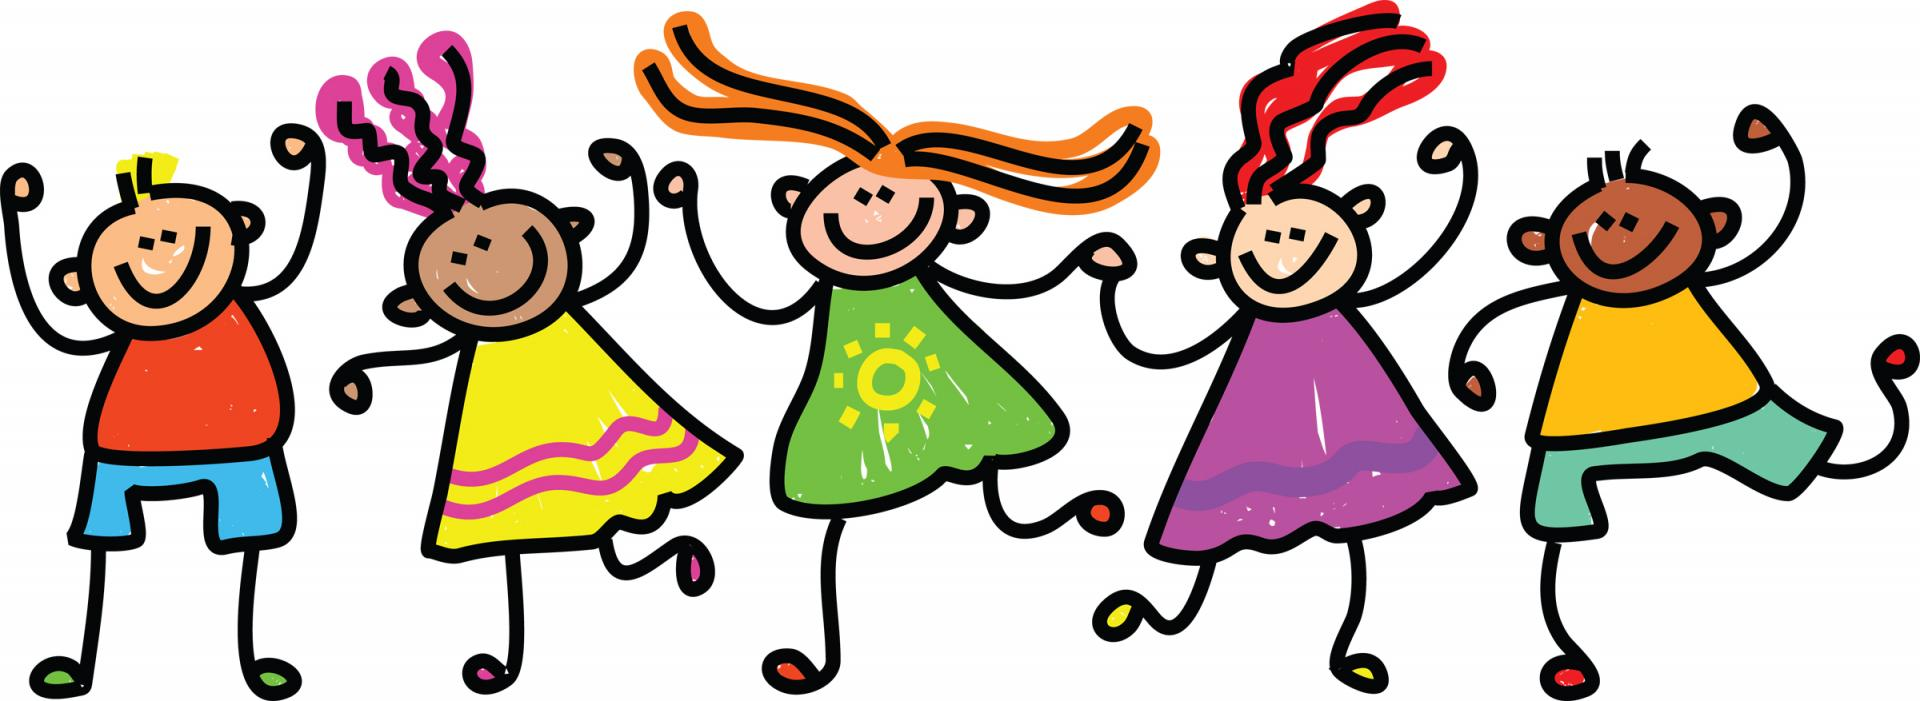 Celebration a of the. Celebrate clipart team